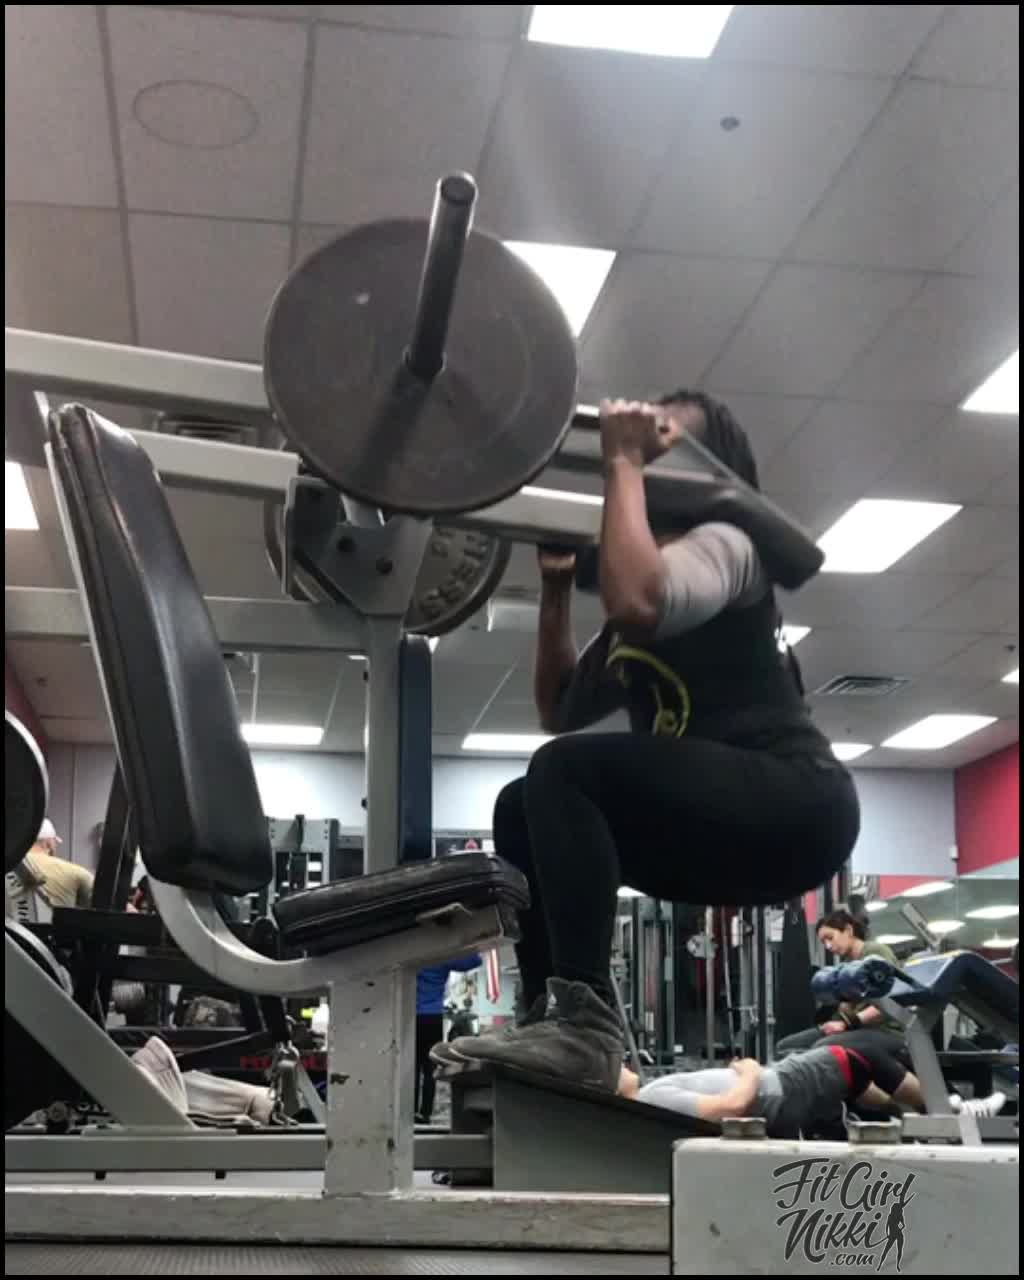 Fit Girl Nikki | Leverage Machine Squats